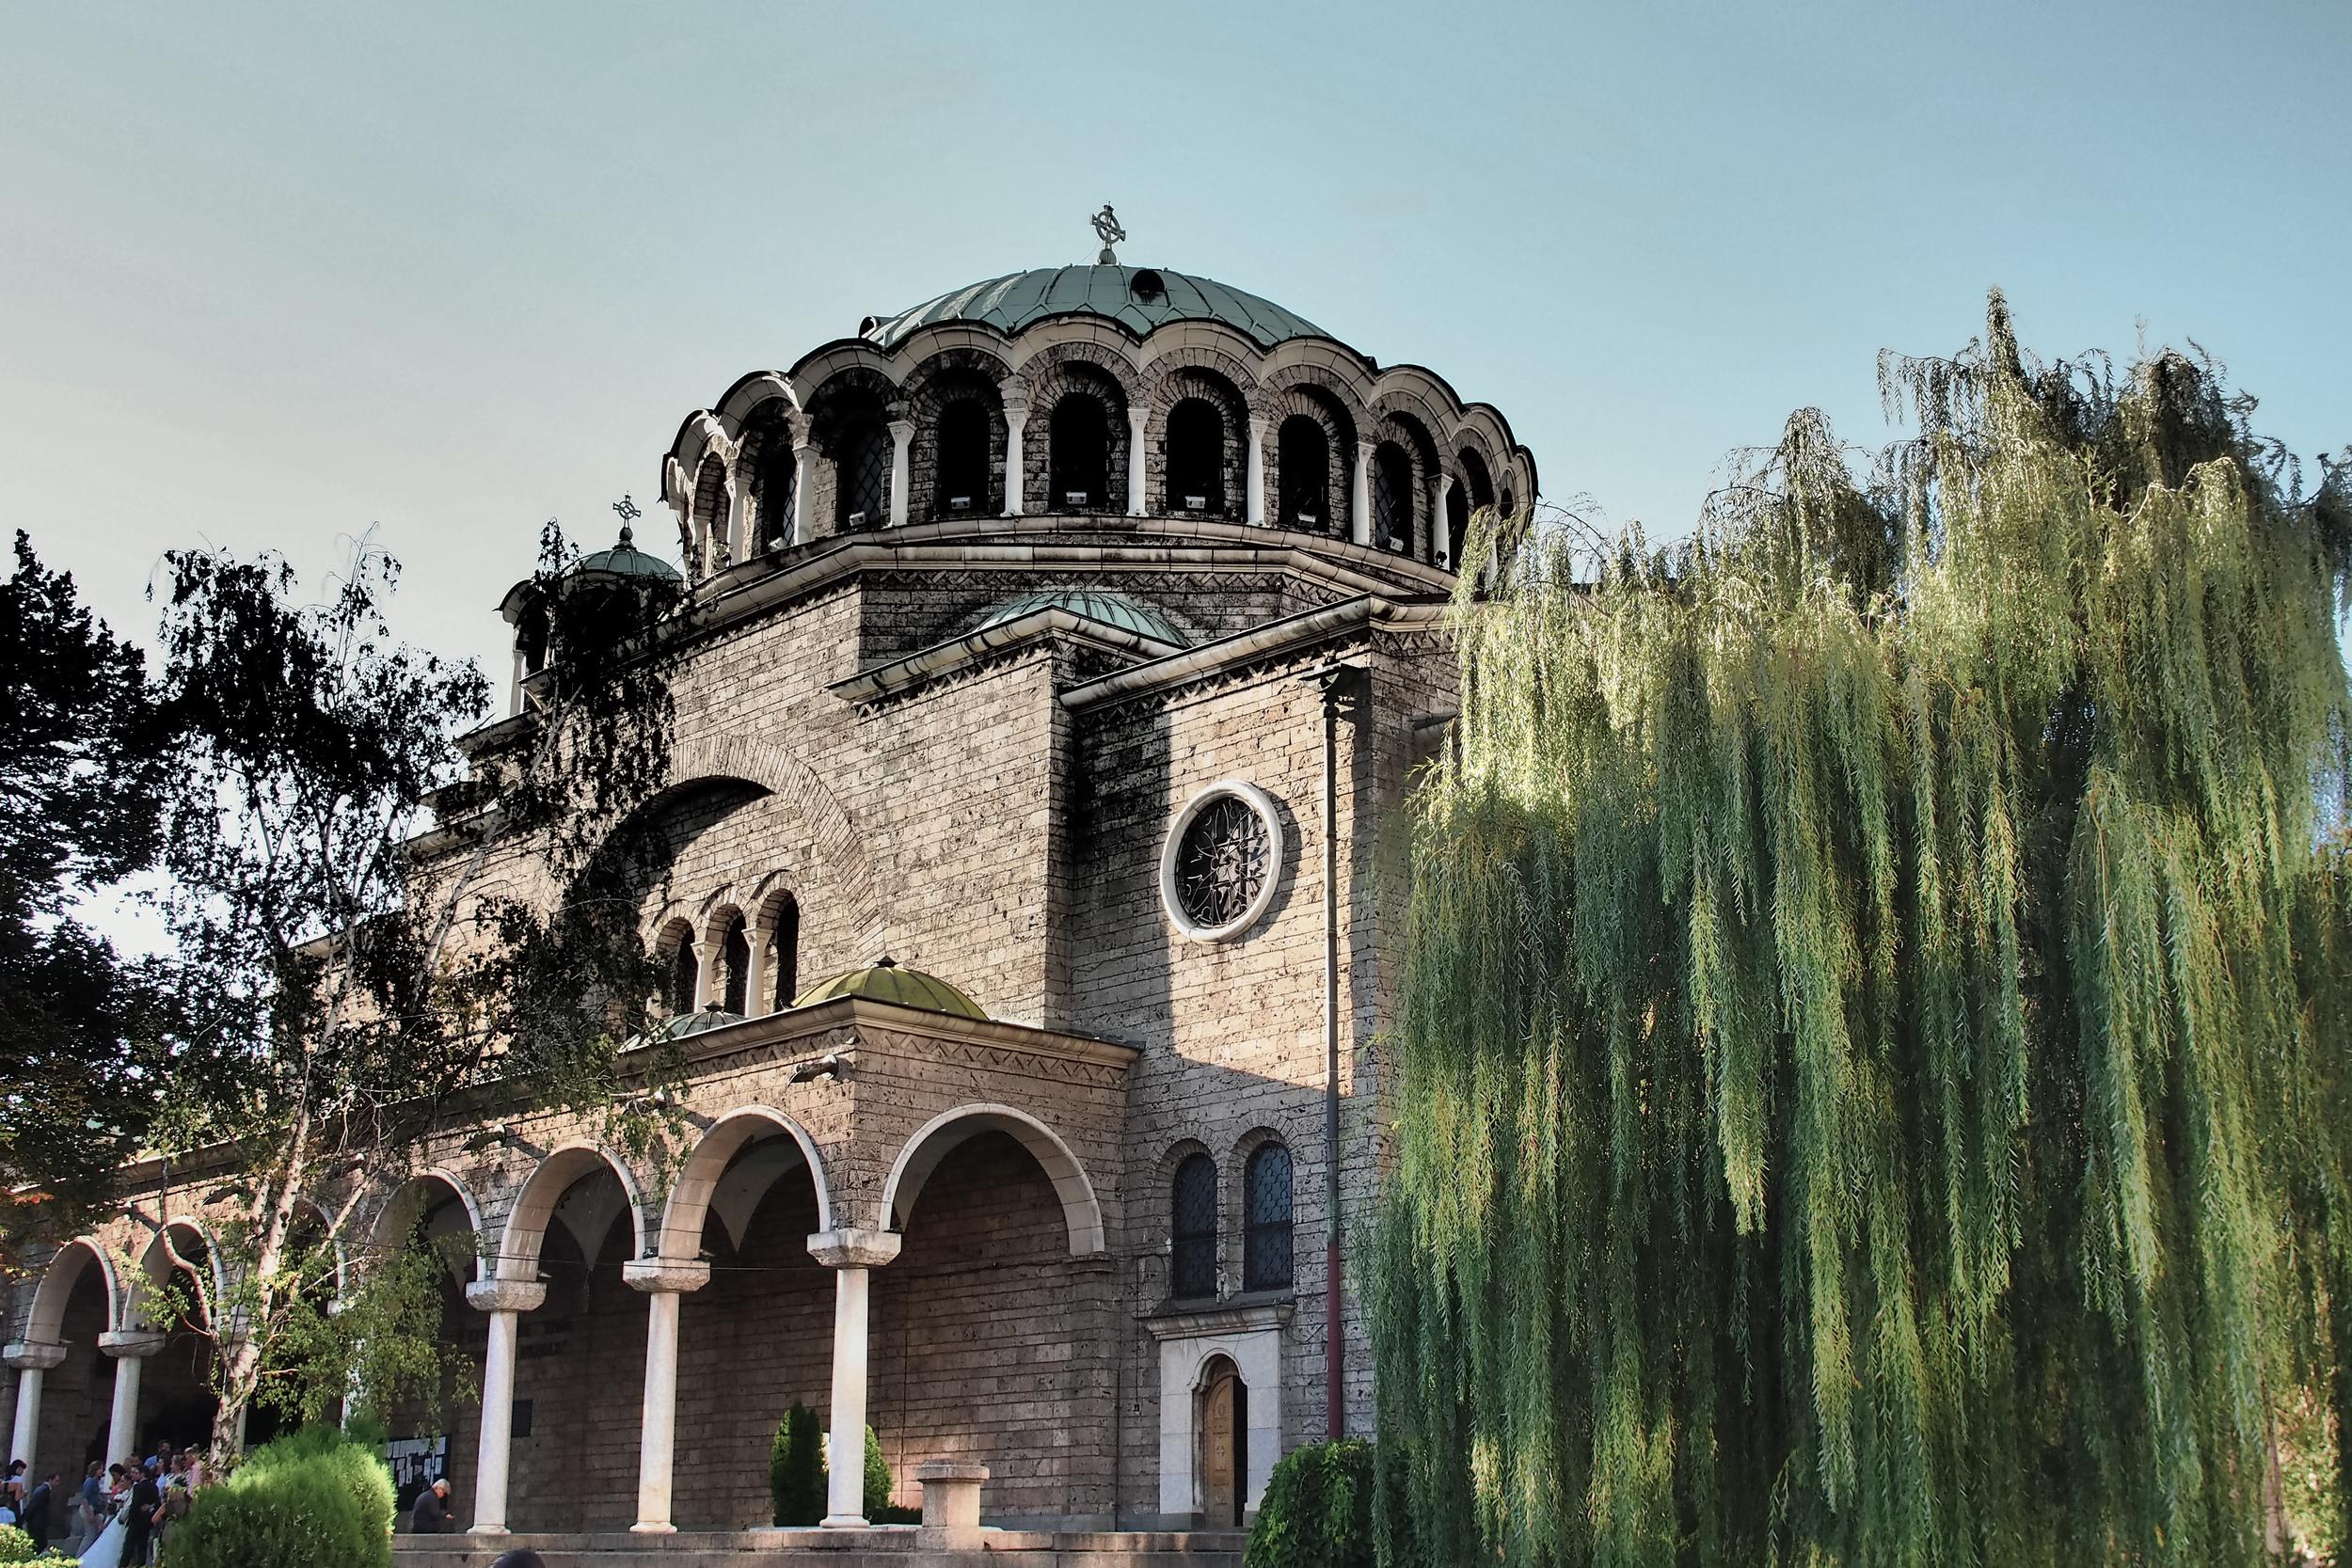 The Sveta Nedelya Church, built above the crossroads of ancient Serdica.